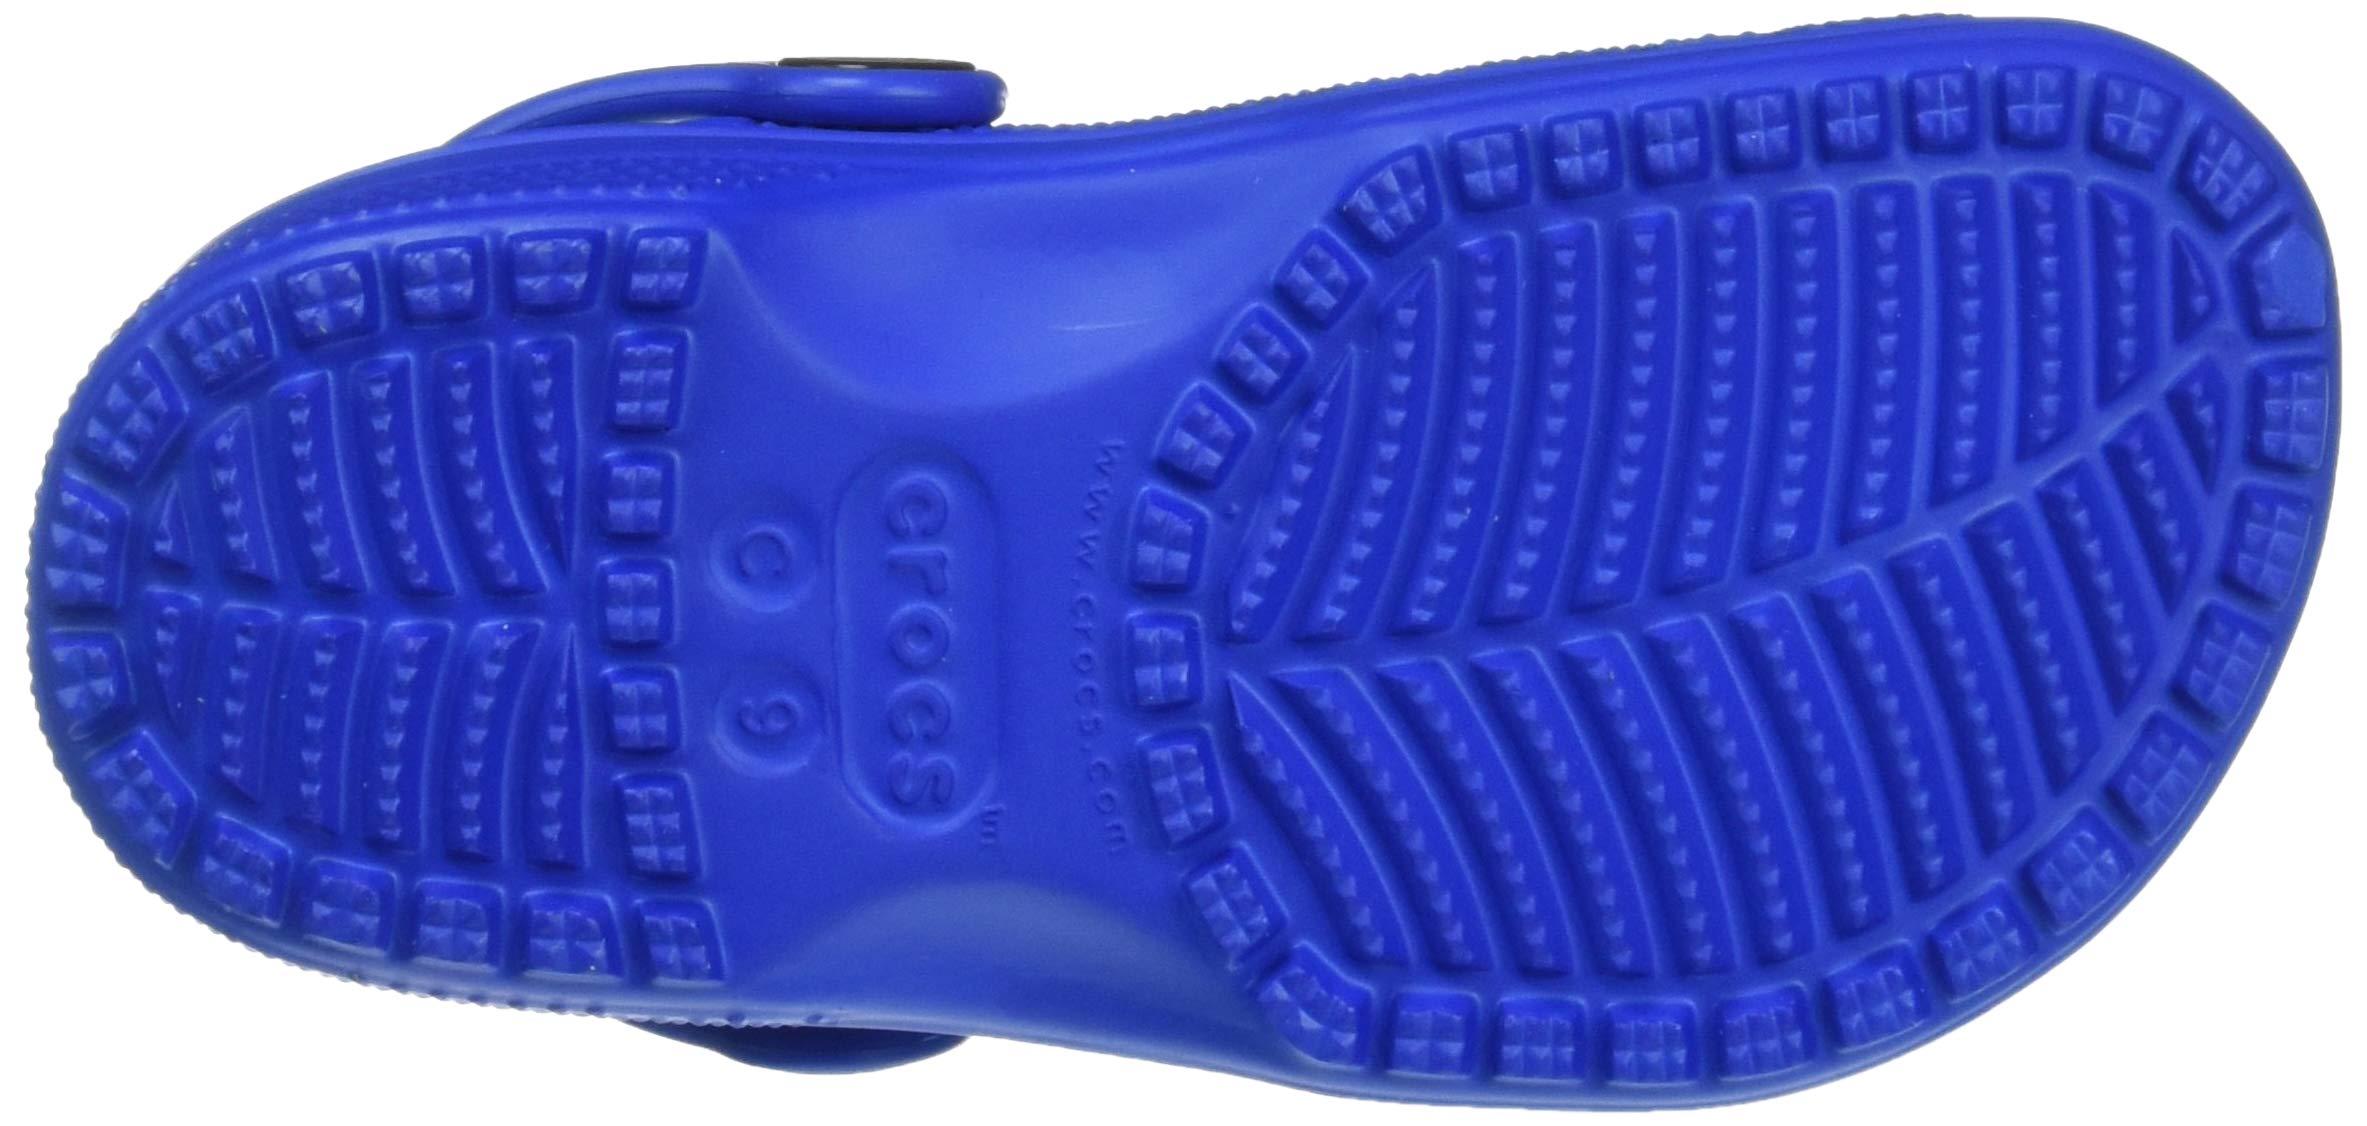 Crocs Classic Clog, Bright Cobalt, 13 M US Little Kid by Crocs (Image #3)